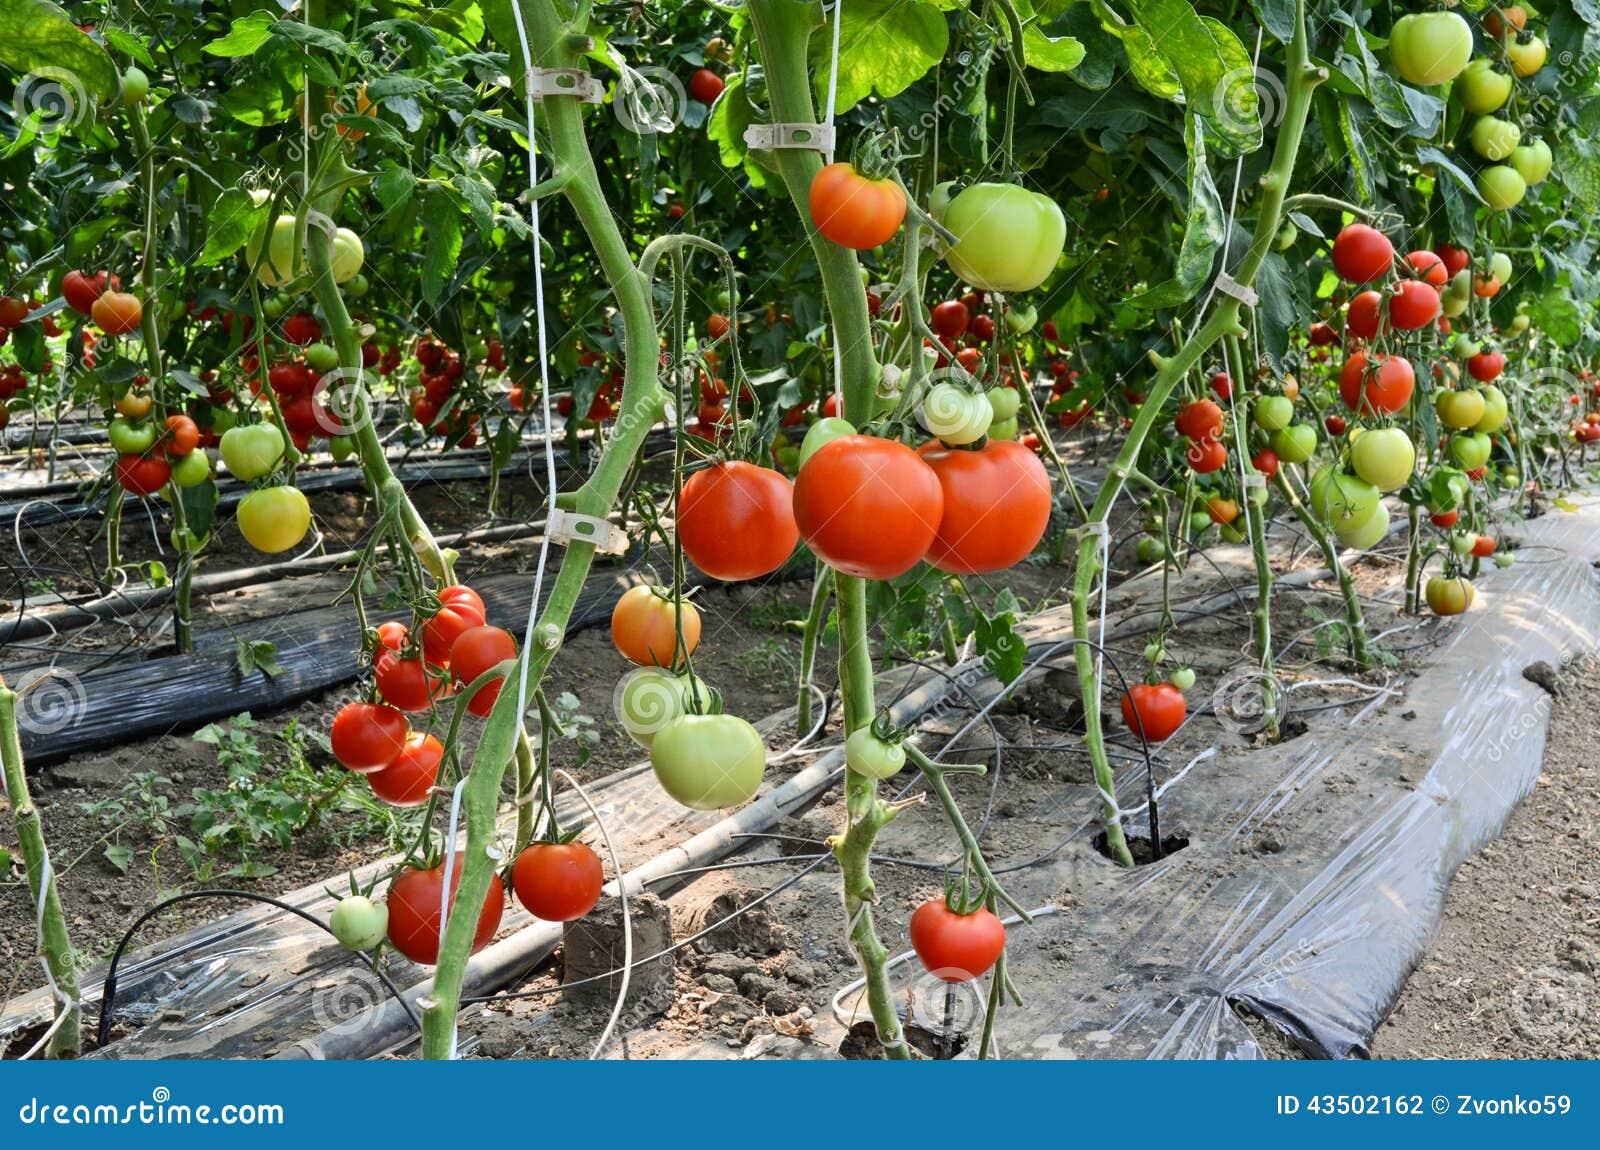 business plan for tomato farming